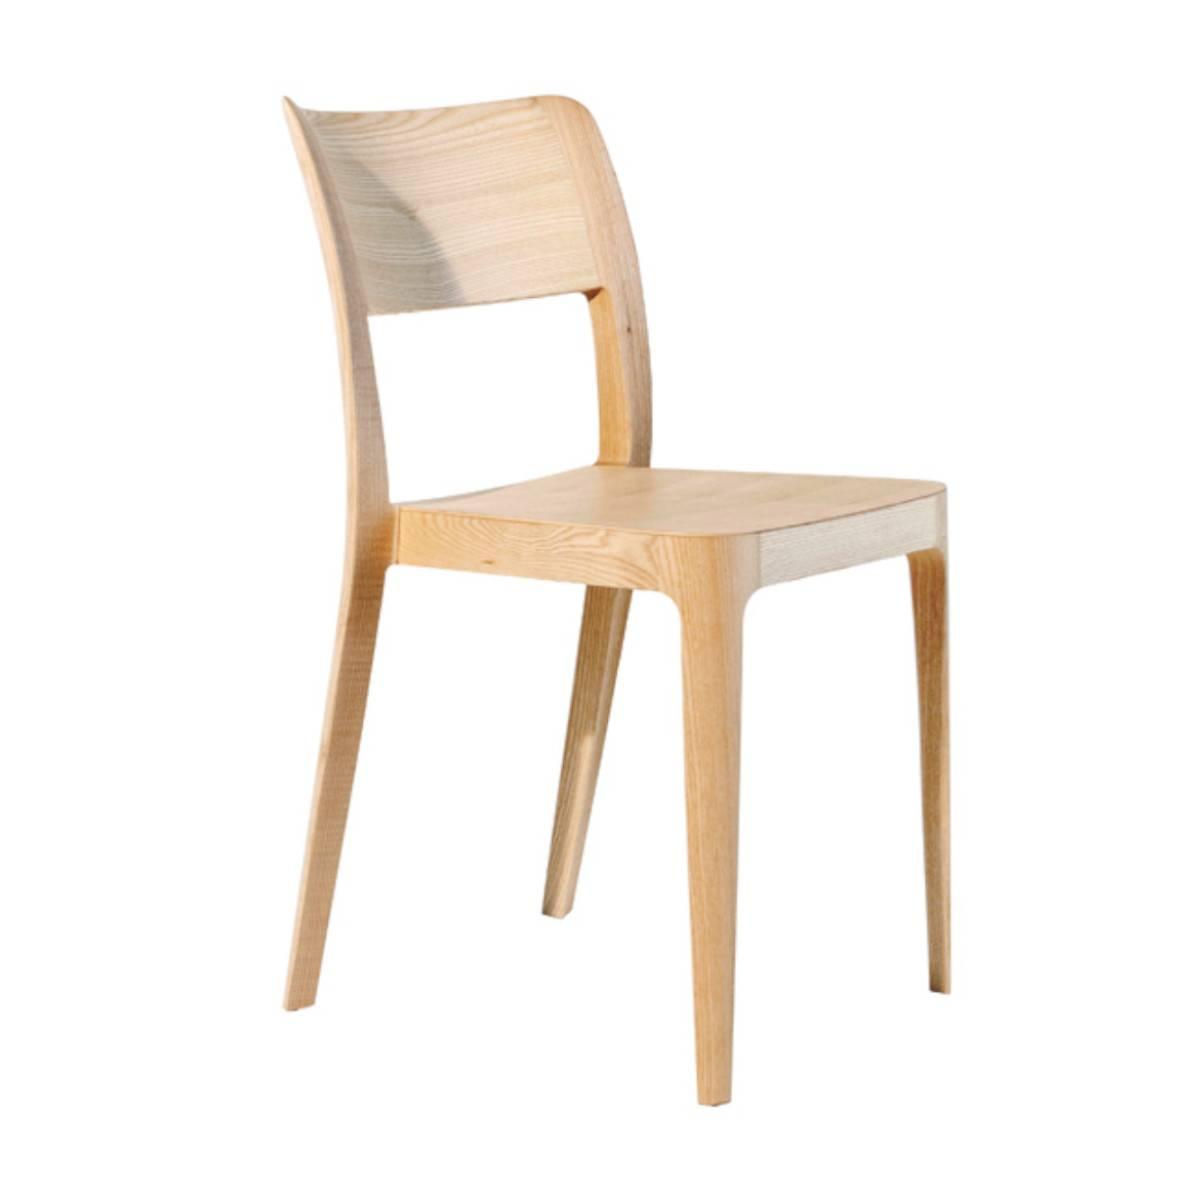 Nene Wood Sedia Midj Sedie E Poltroncine Seminati